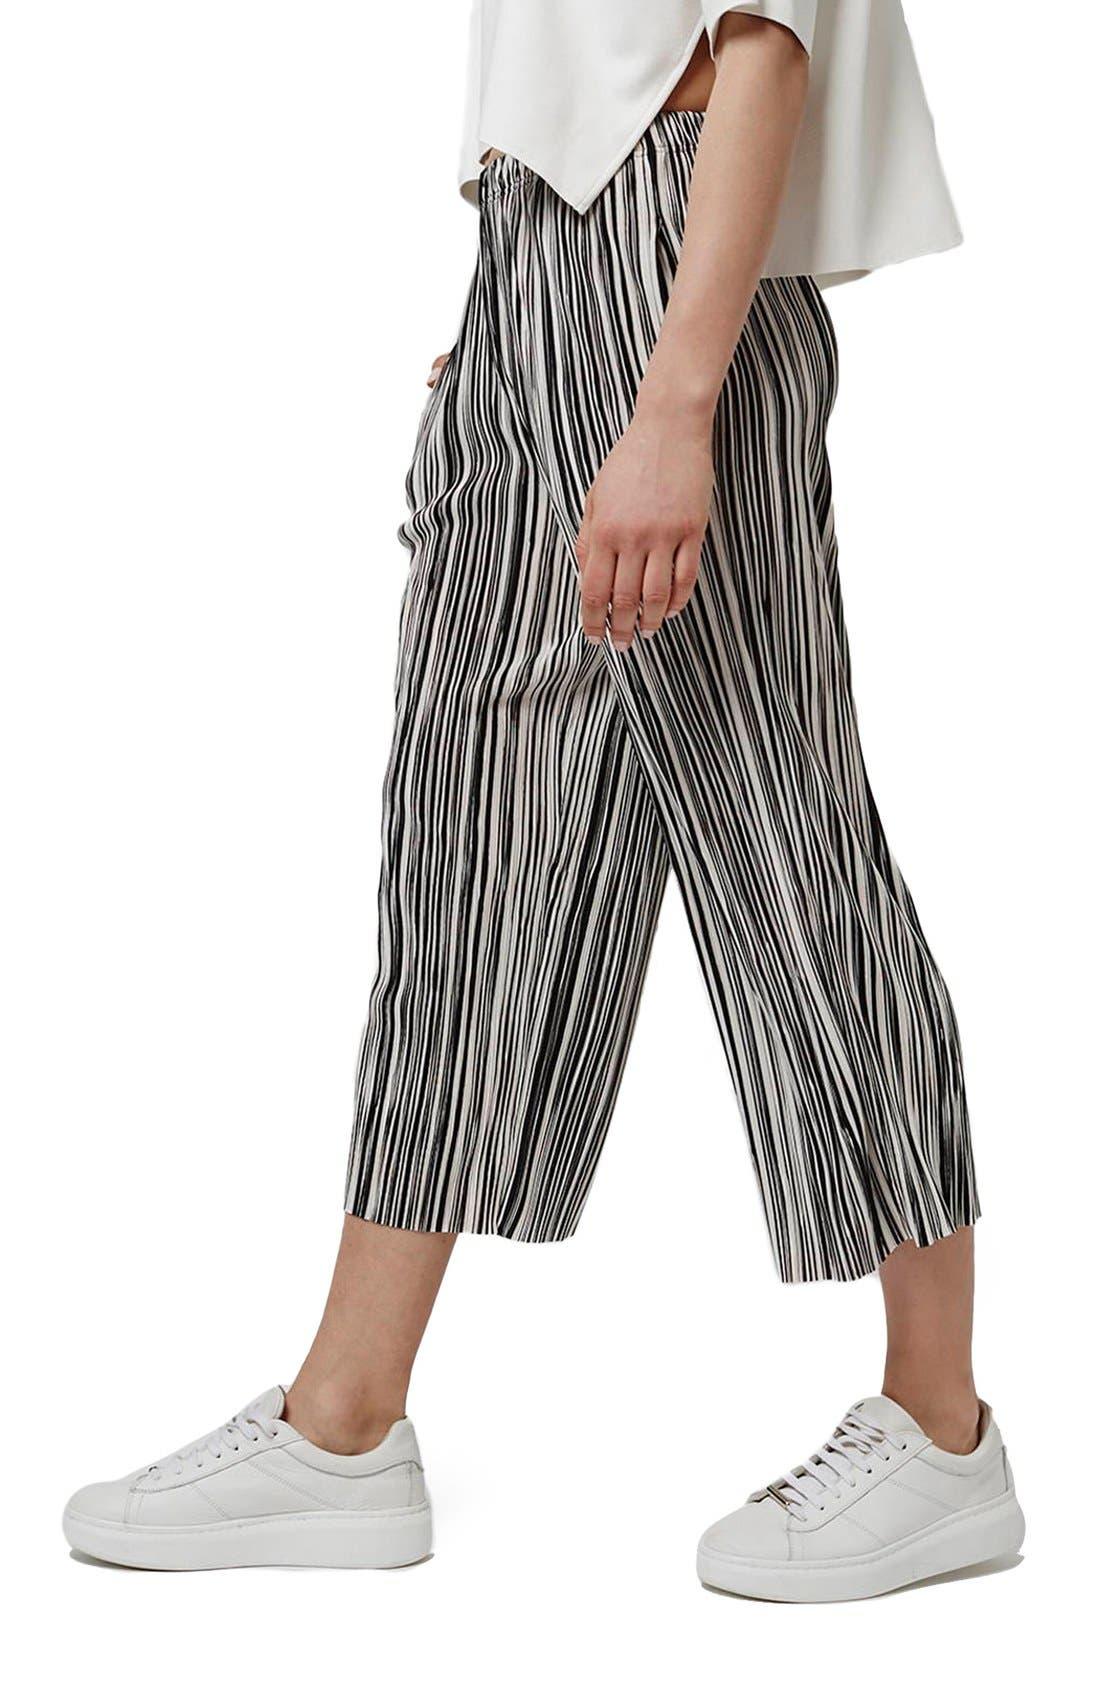 Alternate Image 1 Selected - Topshop Pleat Stripe Crop Trousers (Petite)